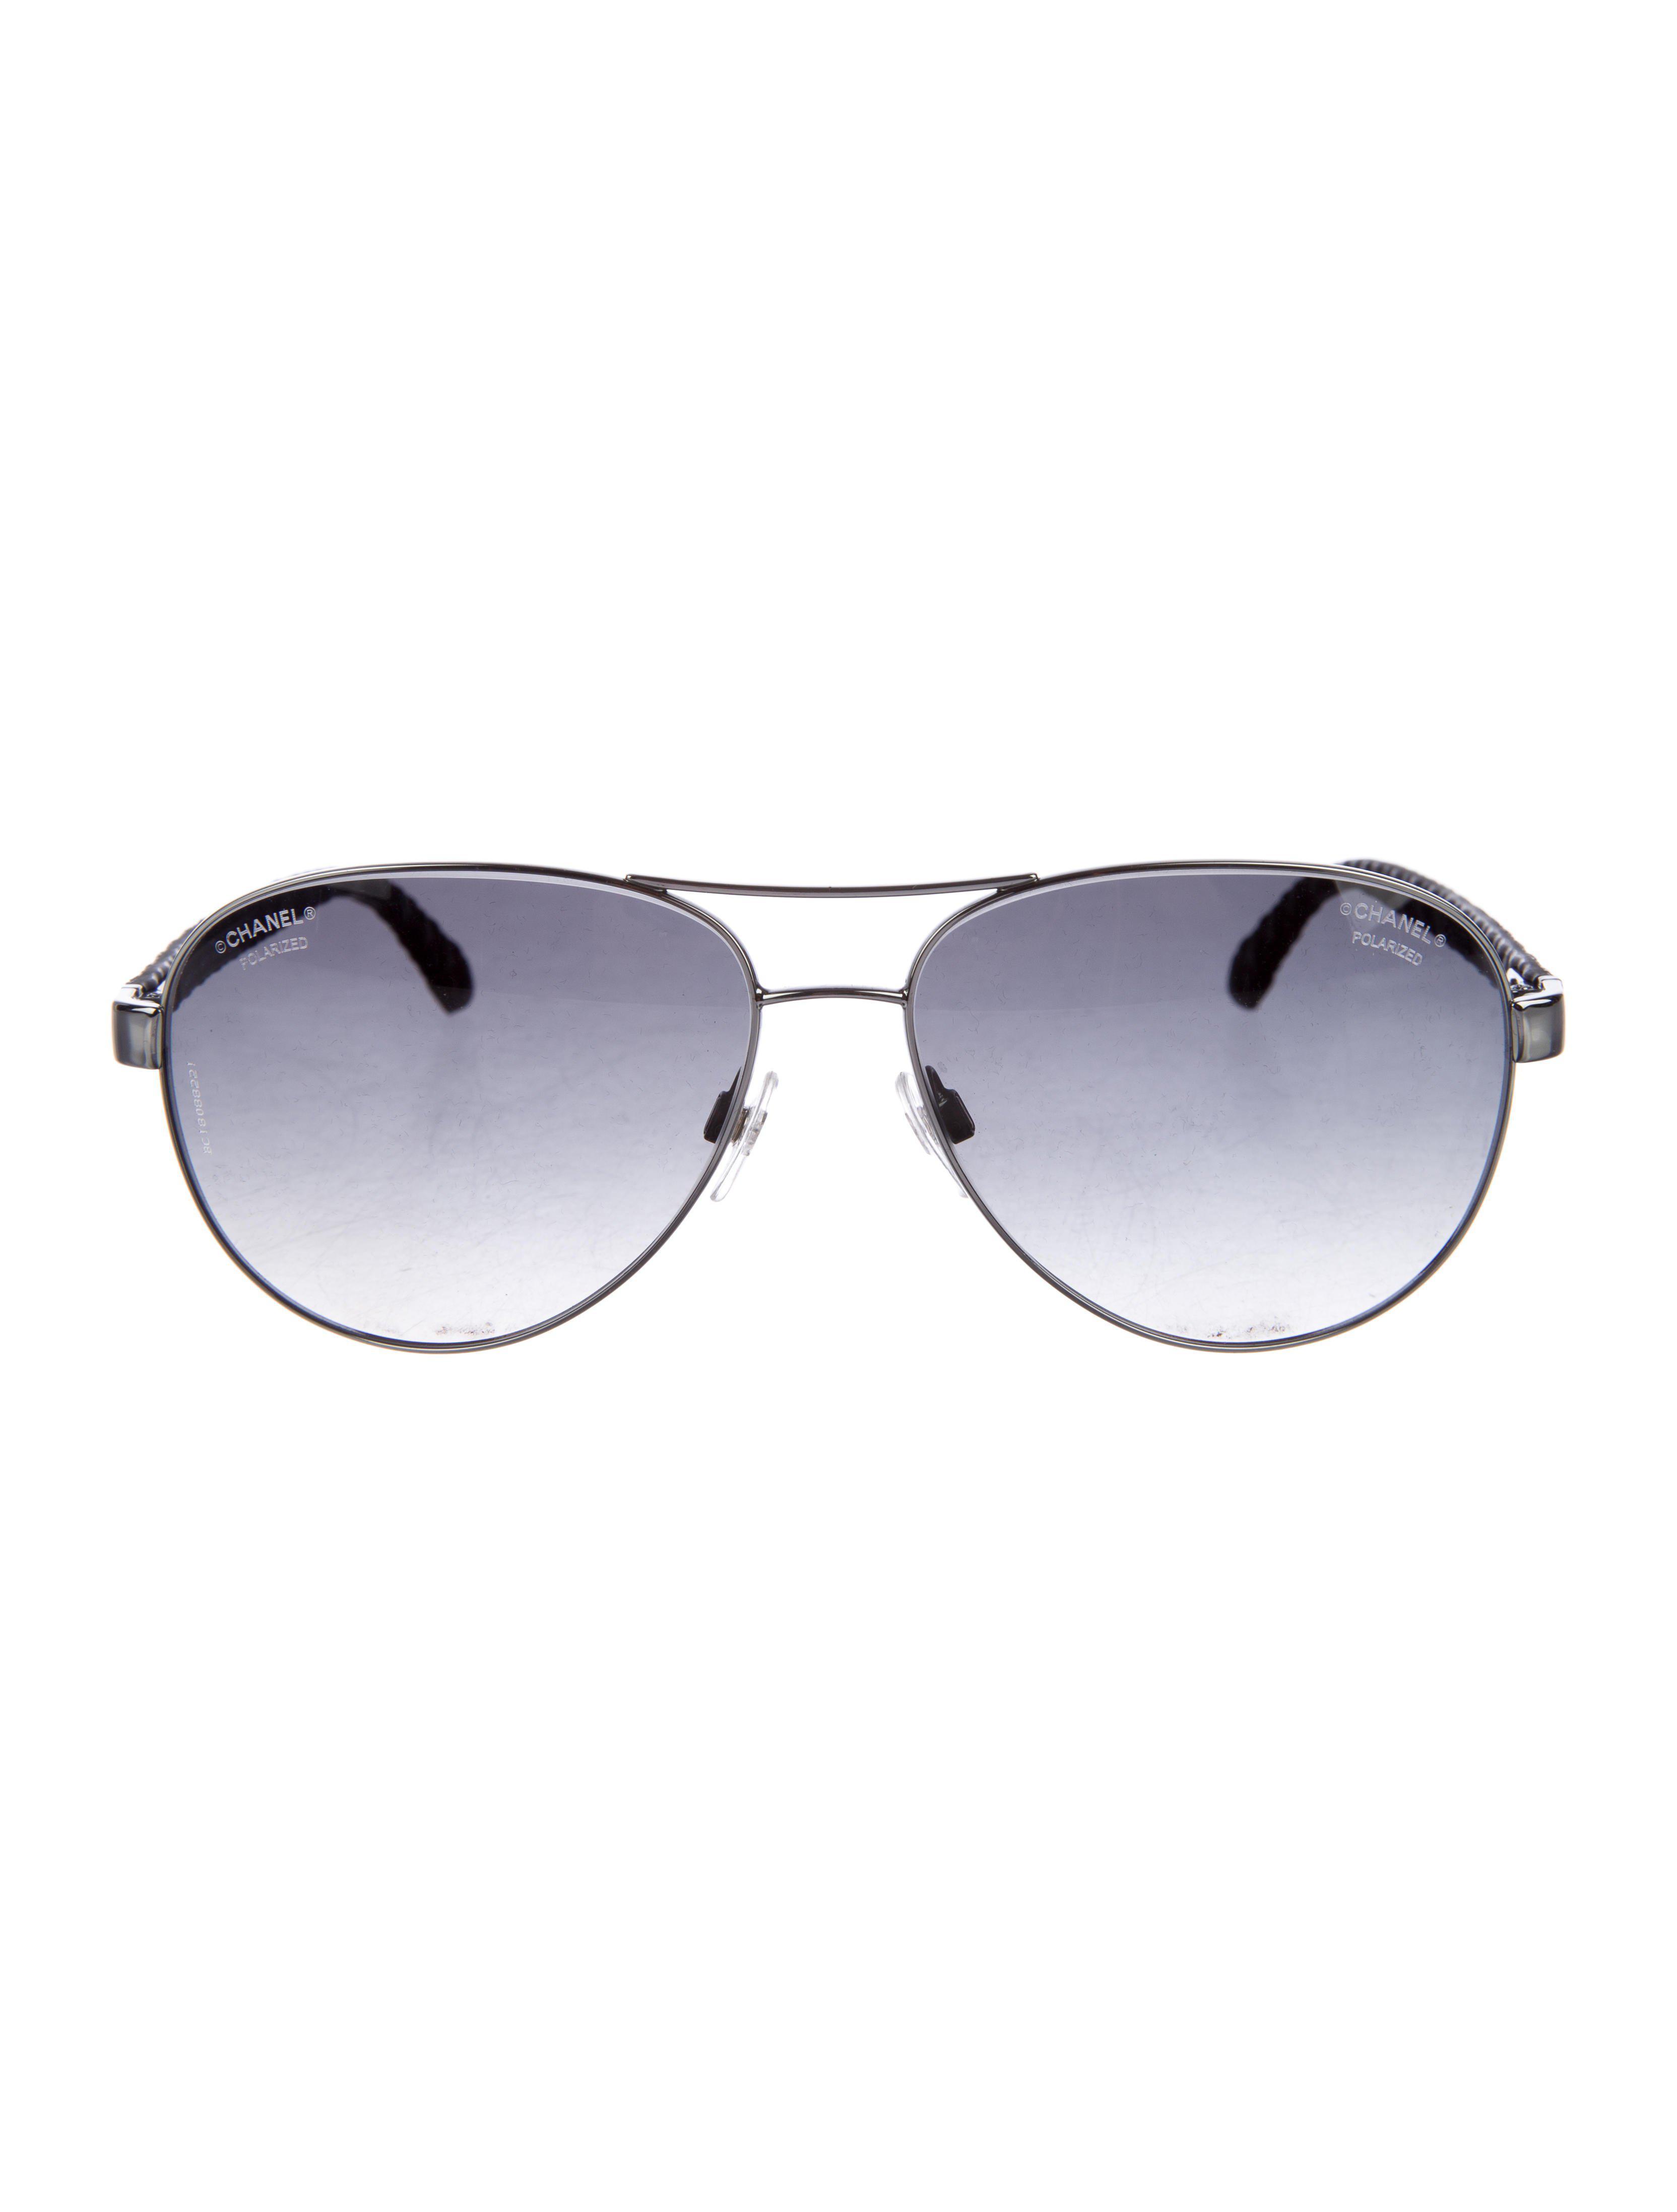 2cccea601b Lyst - Chanel 2017 Pilot Summer Sunglasses in Black